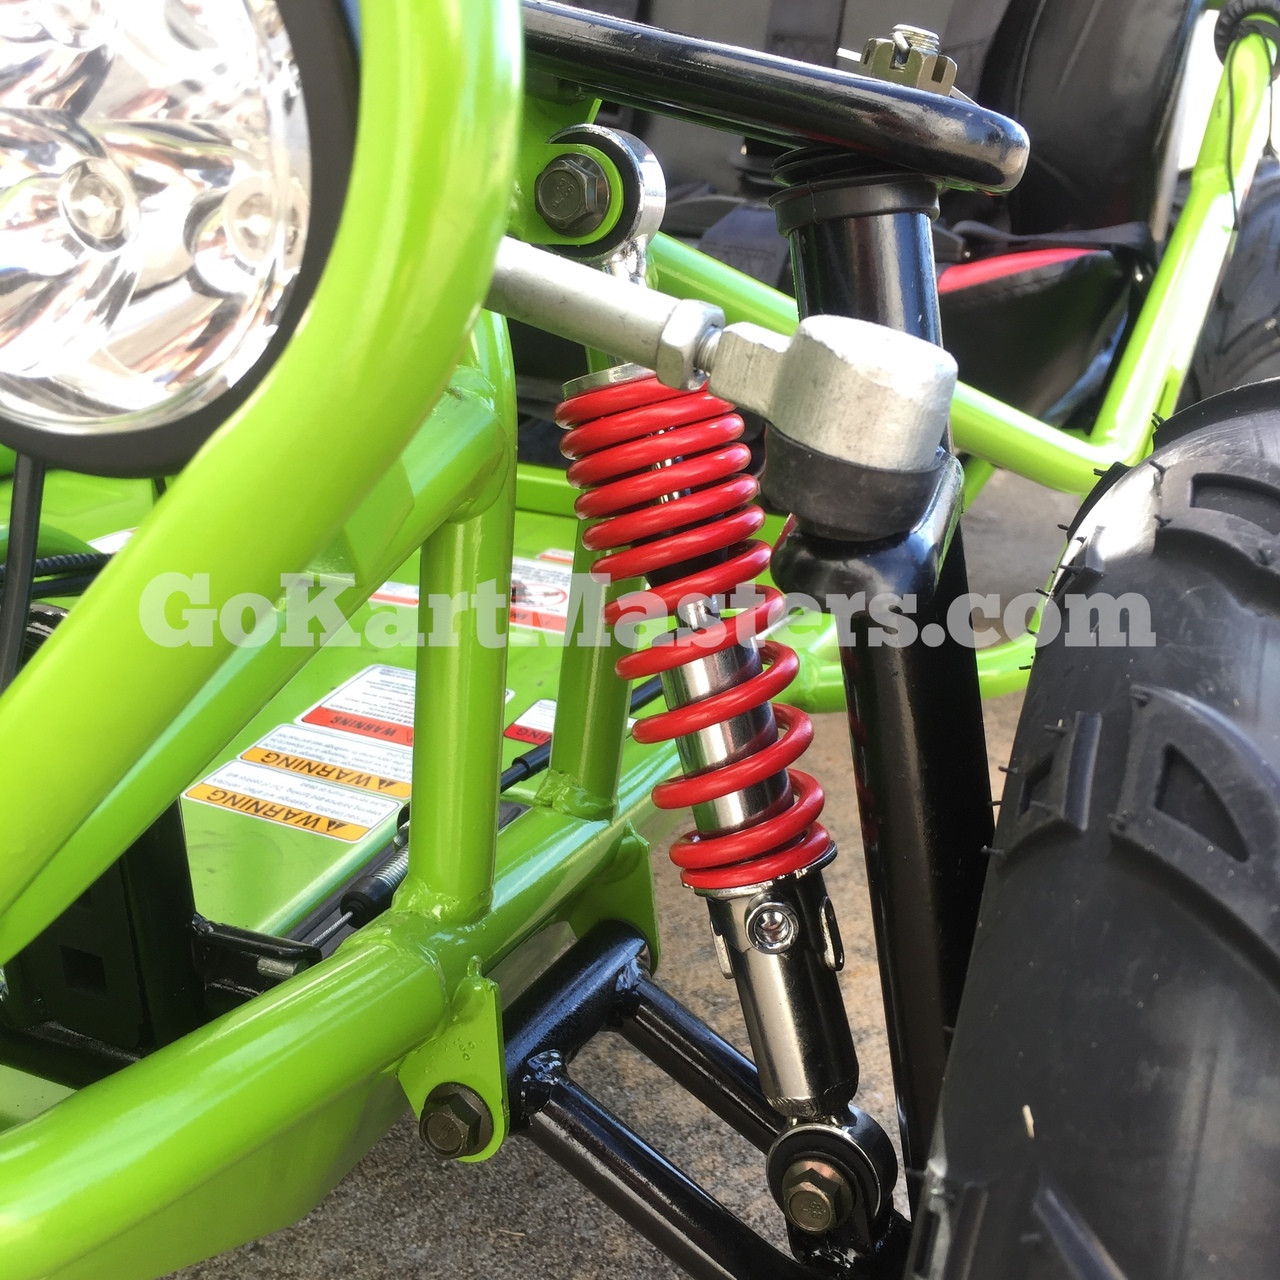 TrailMaster Mini XRX/R+ Go Kart - Front Suspension